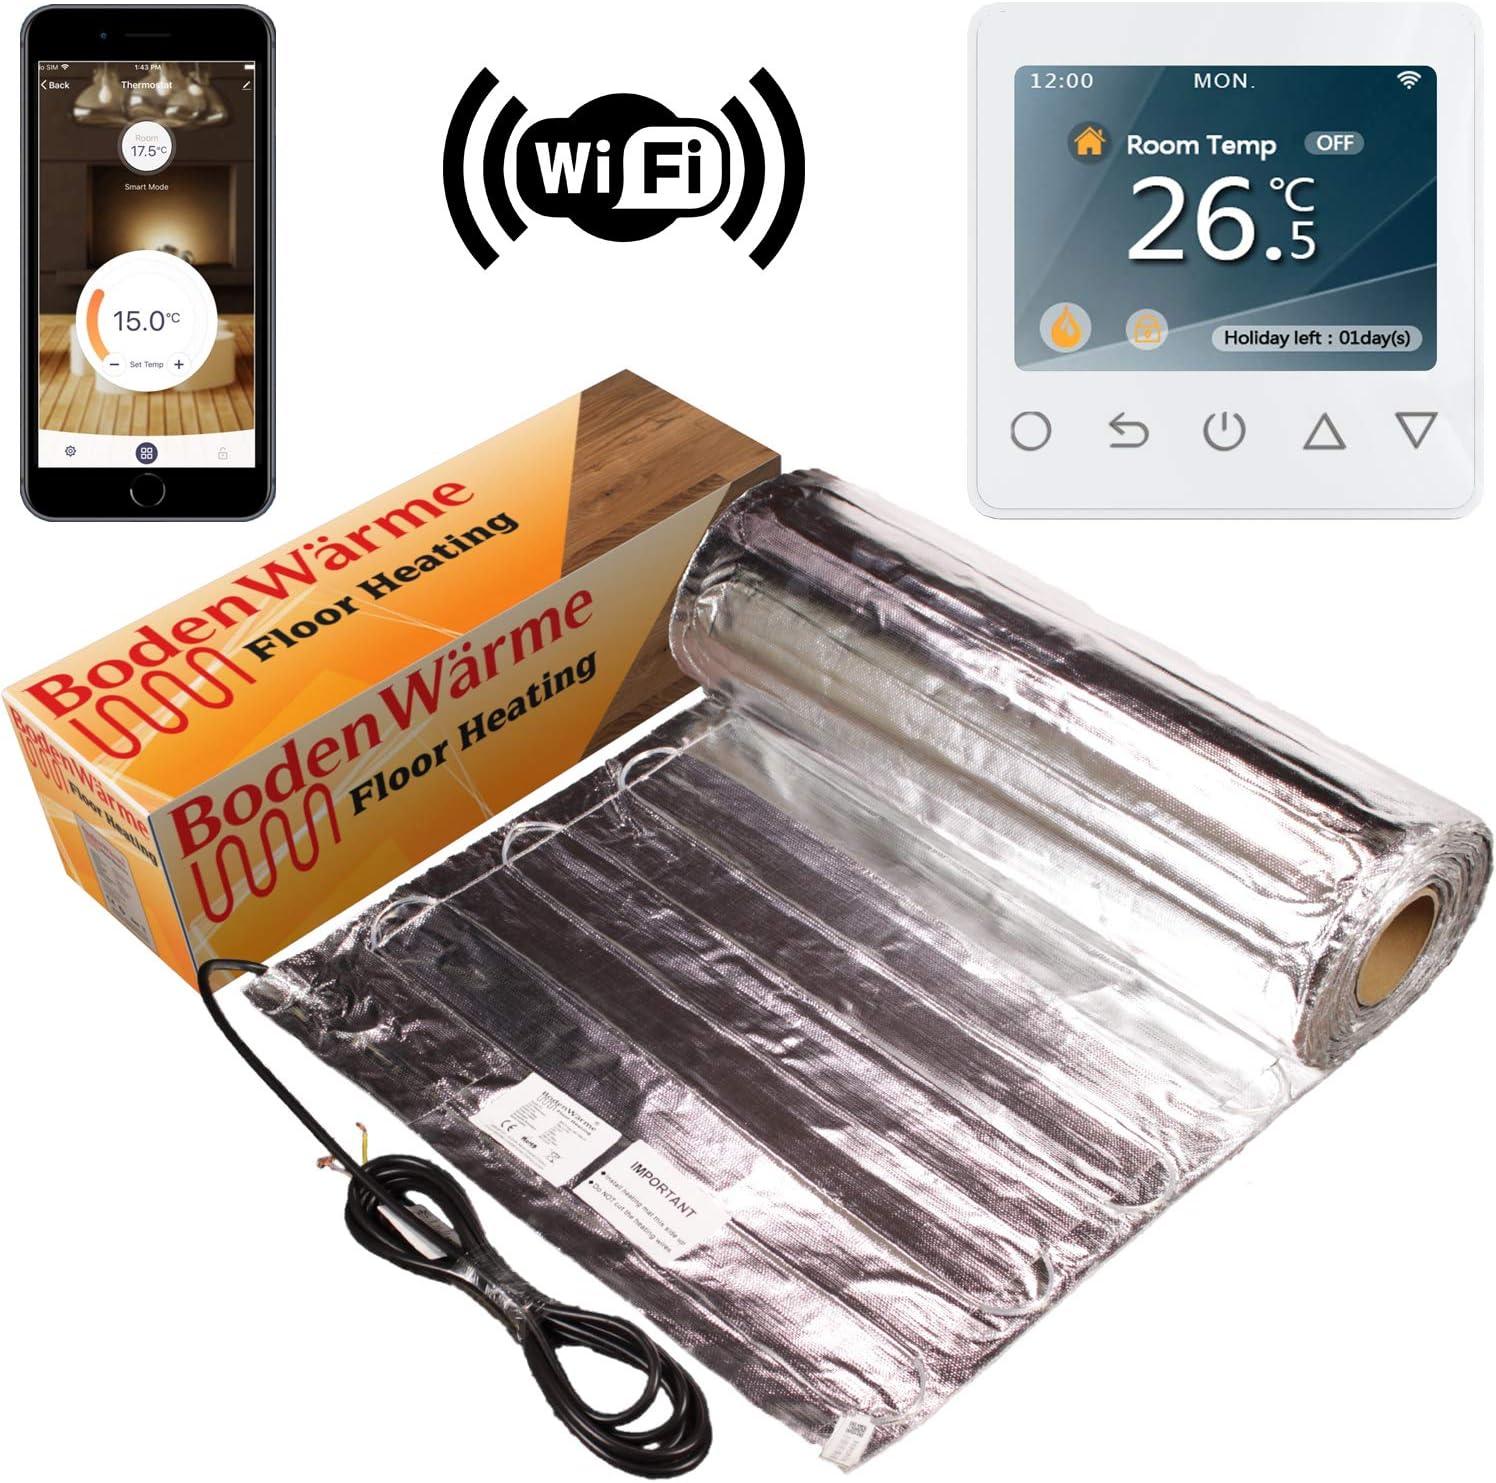 Electric Under Laminate//Wood Foil Underfloor Heating Mat Kit 14m sq, Manual Thermostat